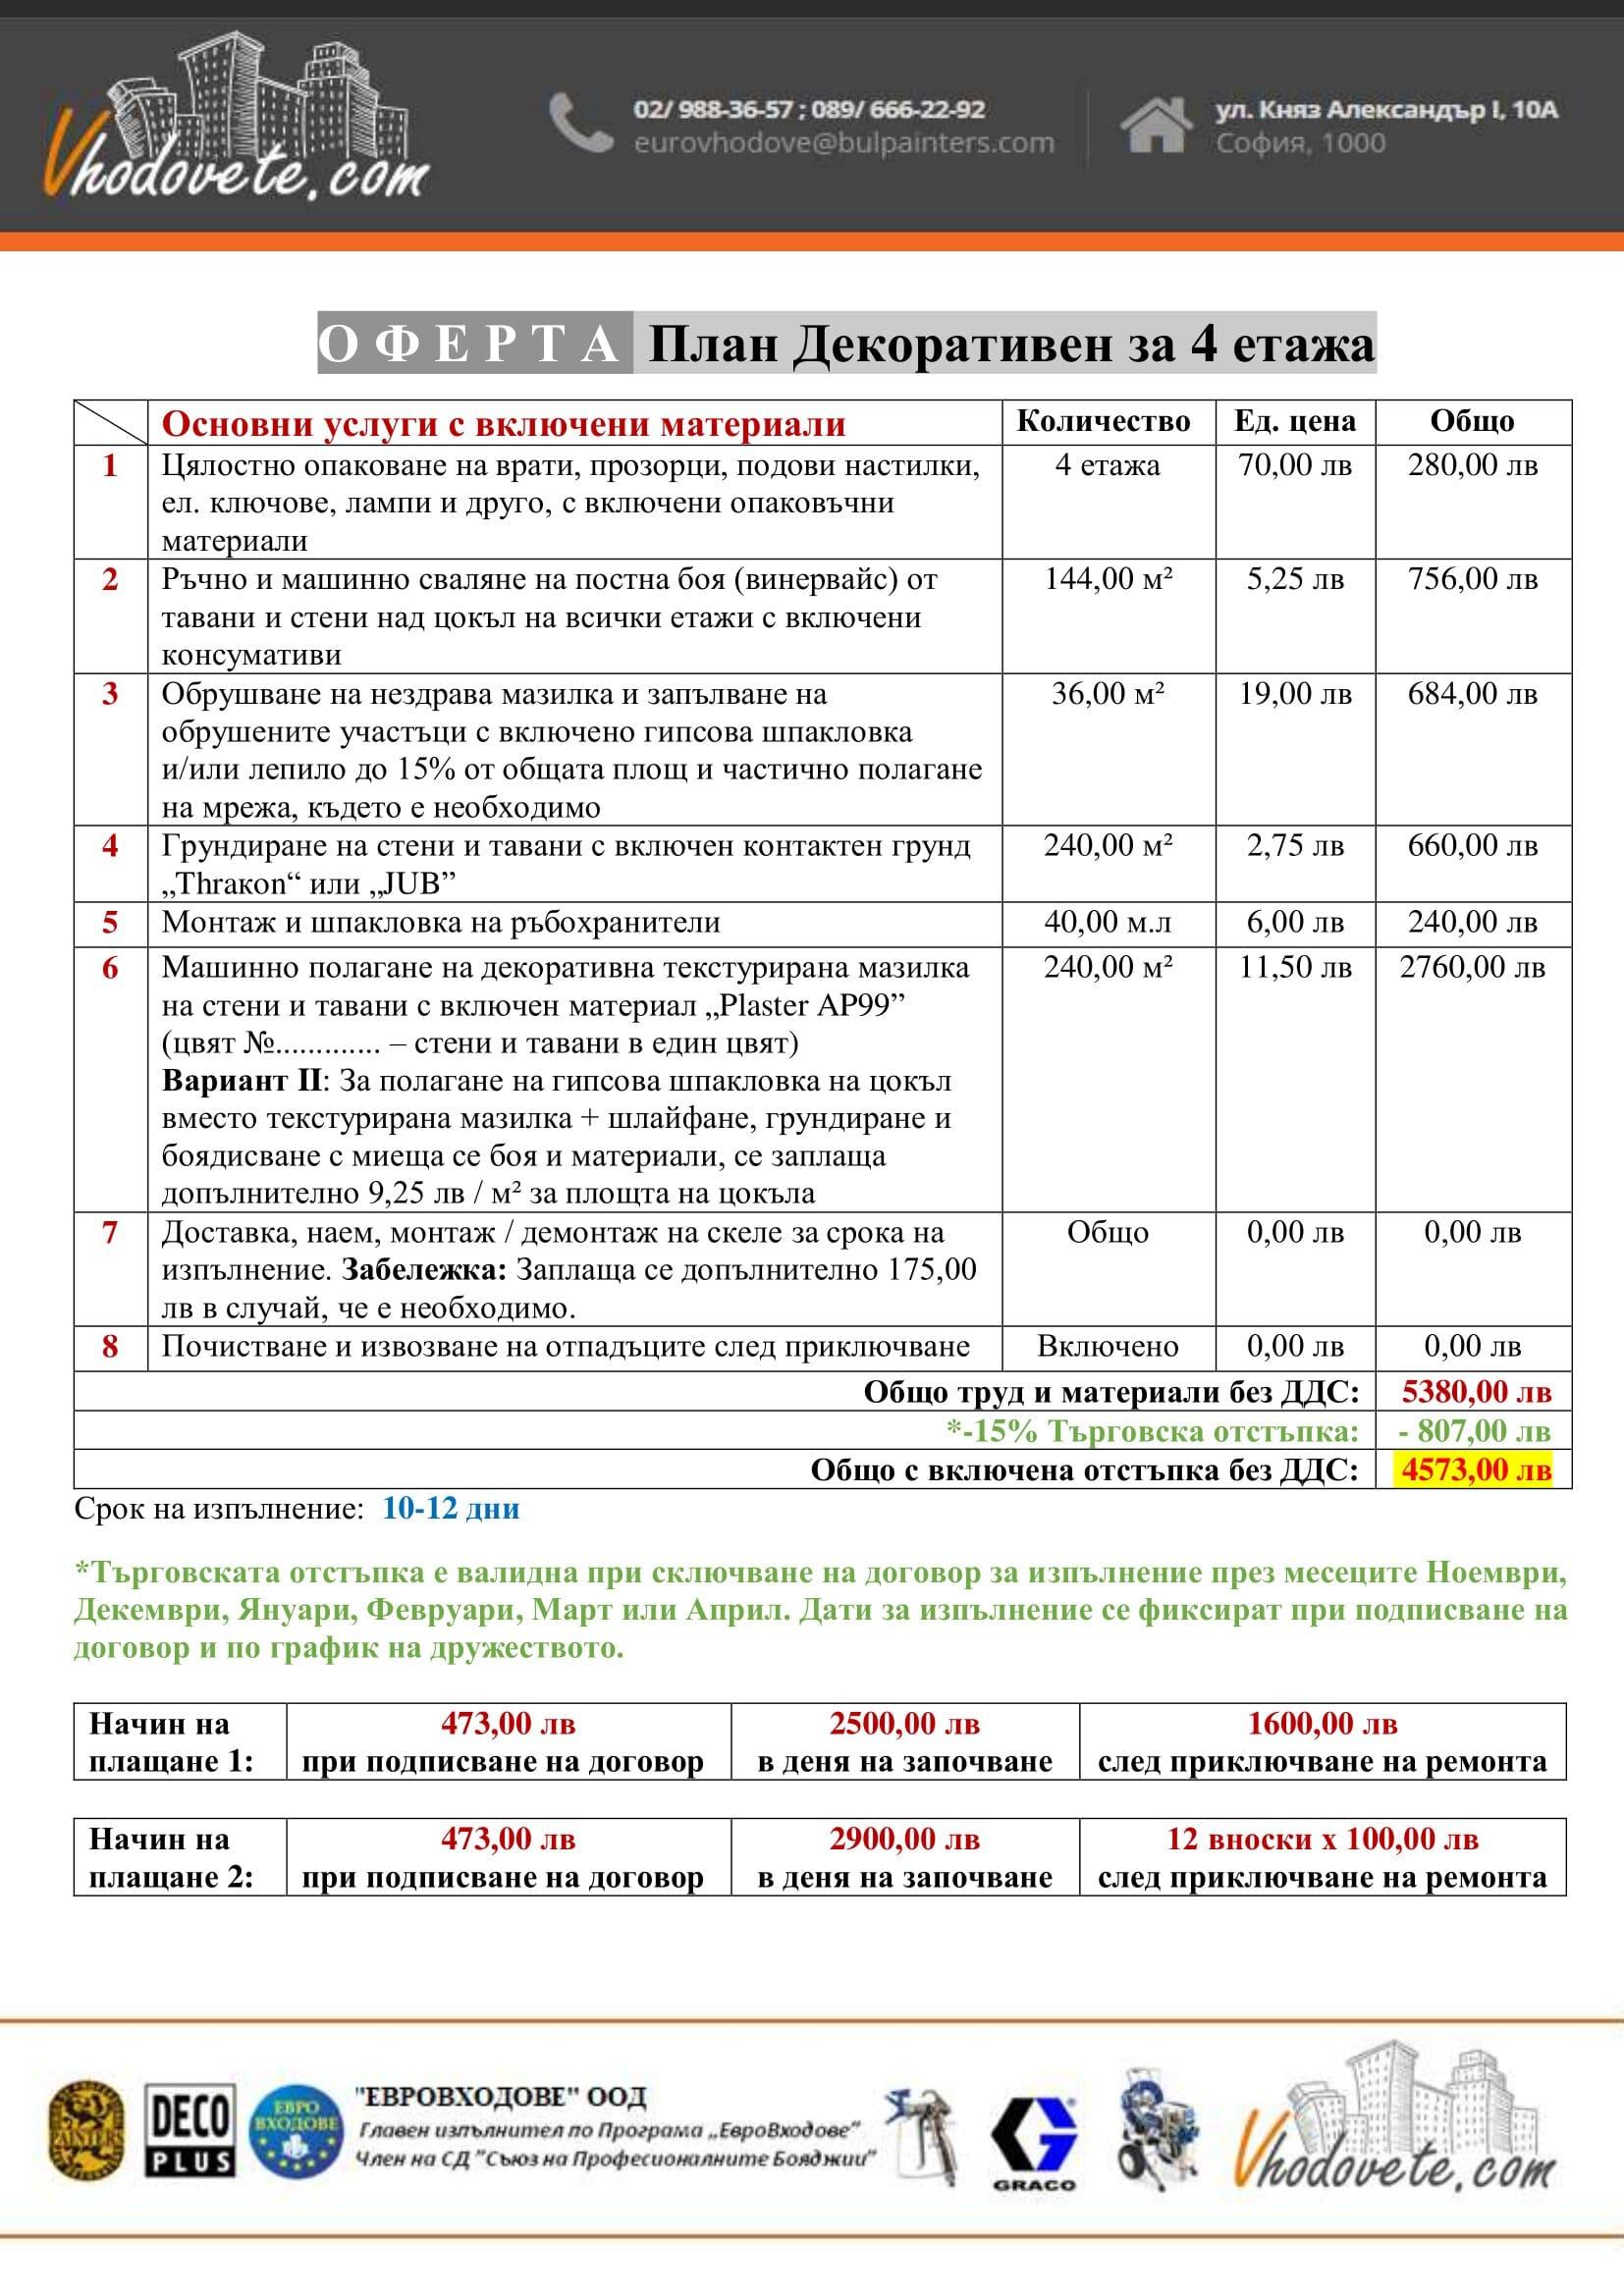 3-Oferta-za-4-et-Dekorativen-01102020